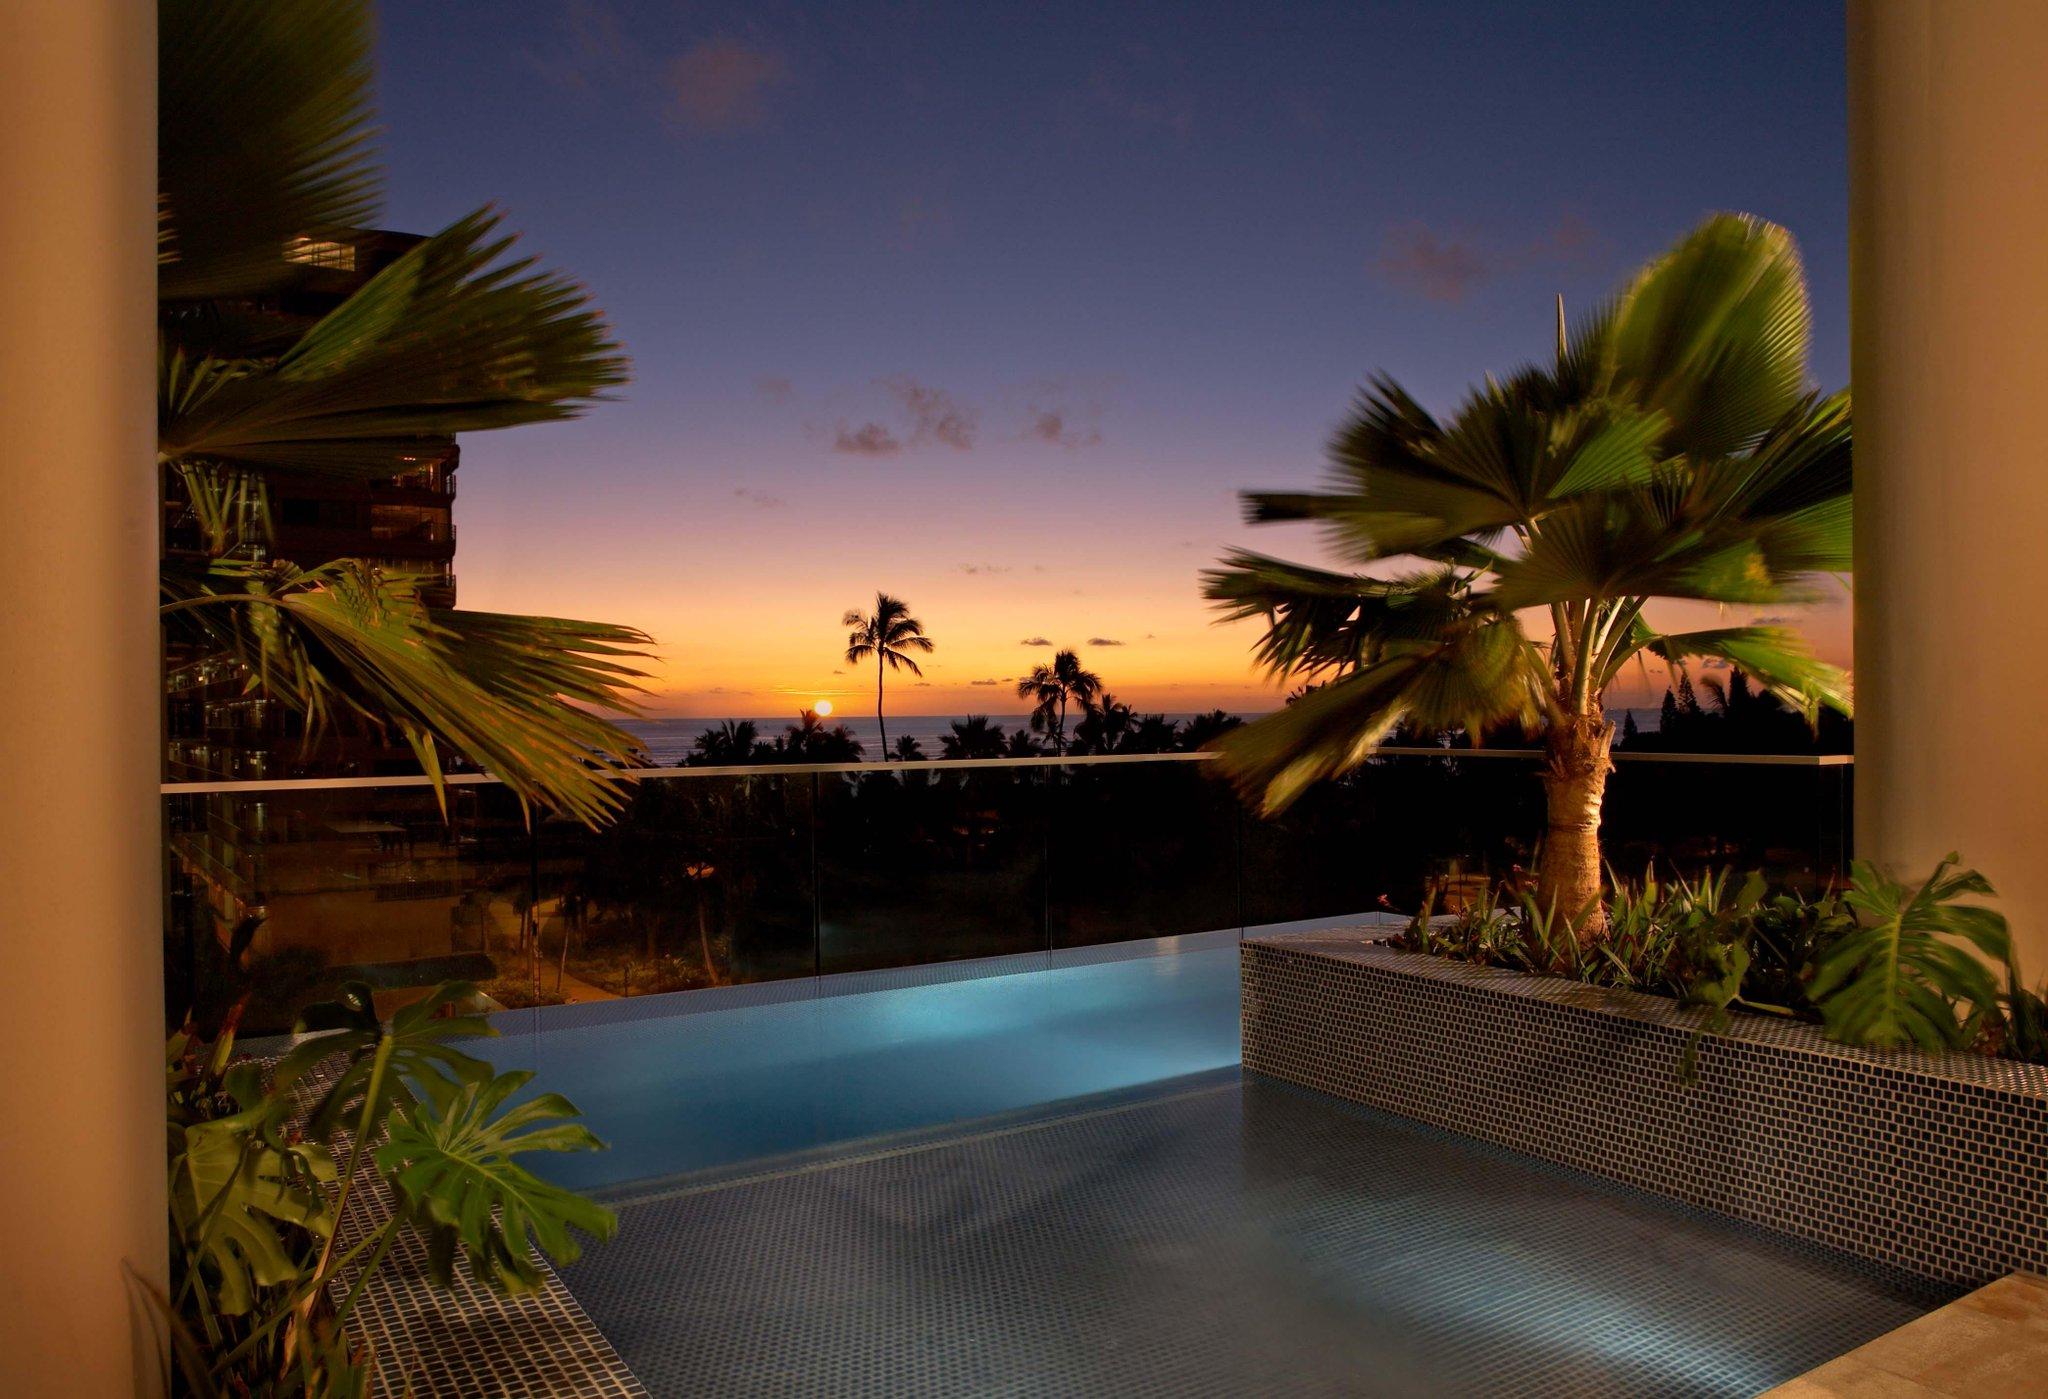 Sunsets from @TrumpWaikiki's Infinity Pool Deck are unbeatable. http://t.co/0hKodI2uYD